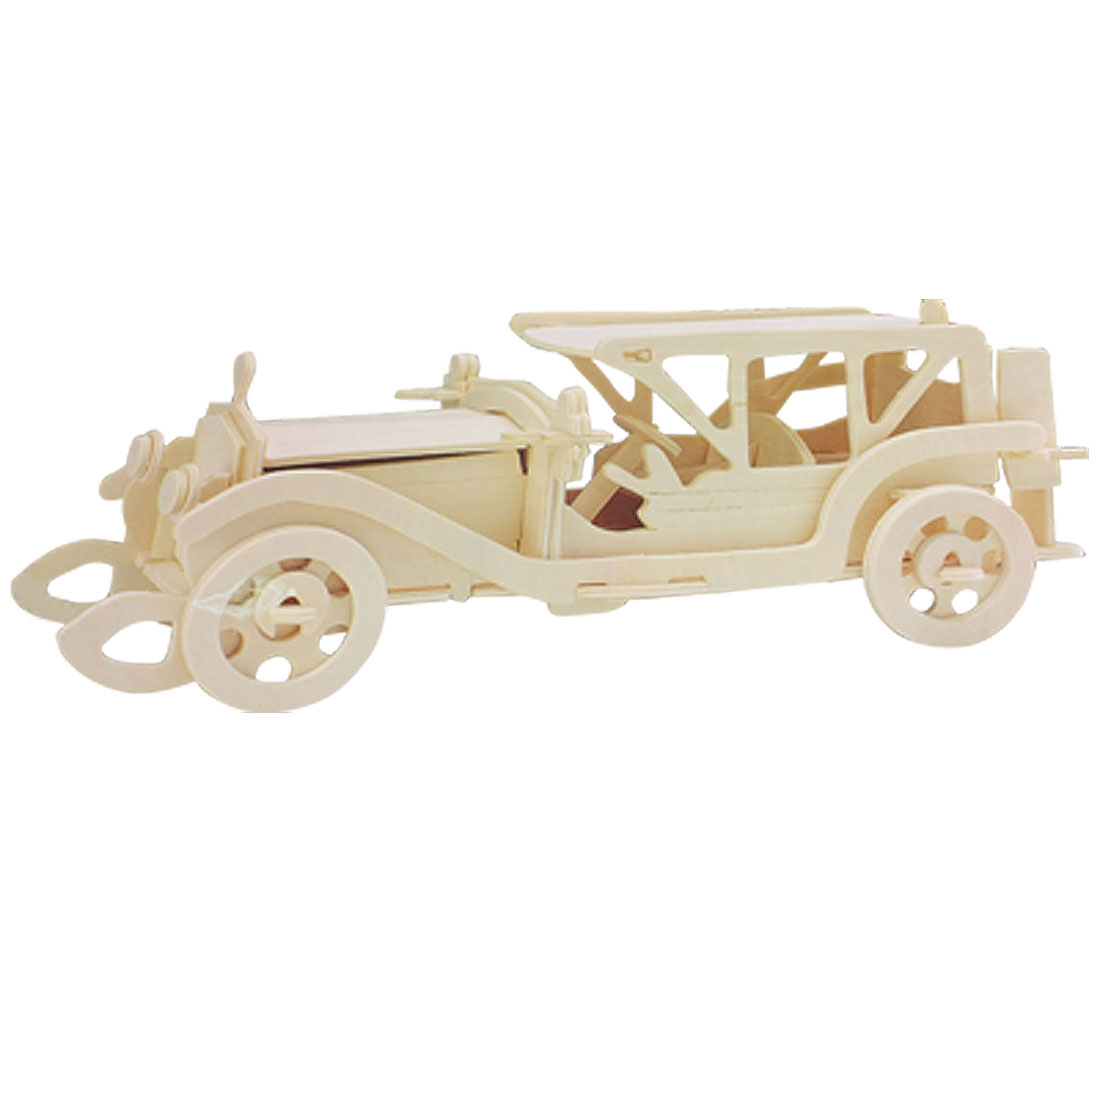 Puzzled 3D DIY Sunbeam Car Model Assemble Wooden Kit for Children